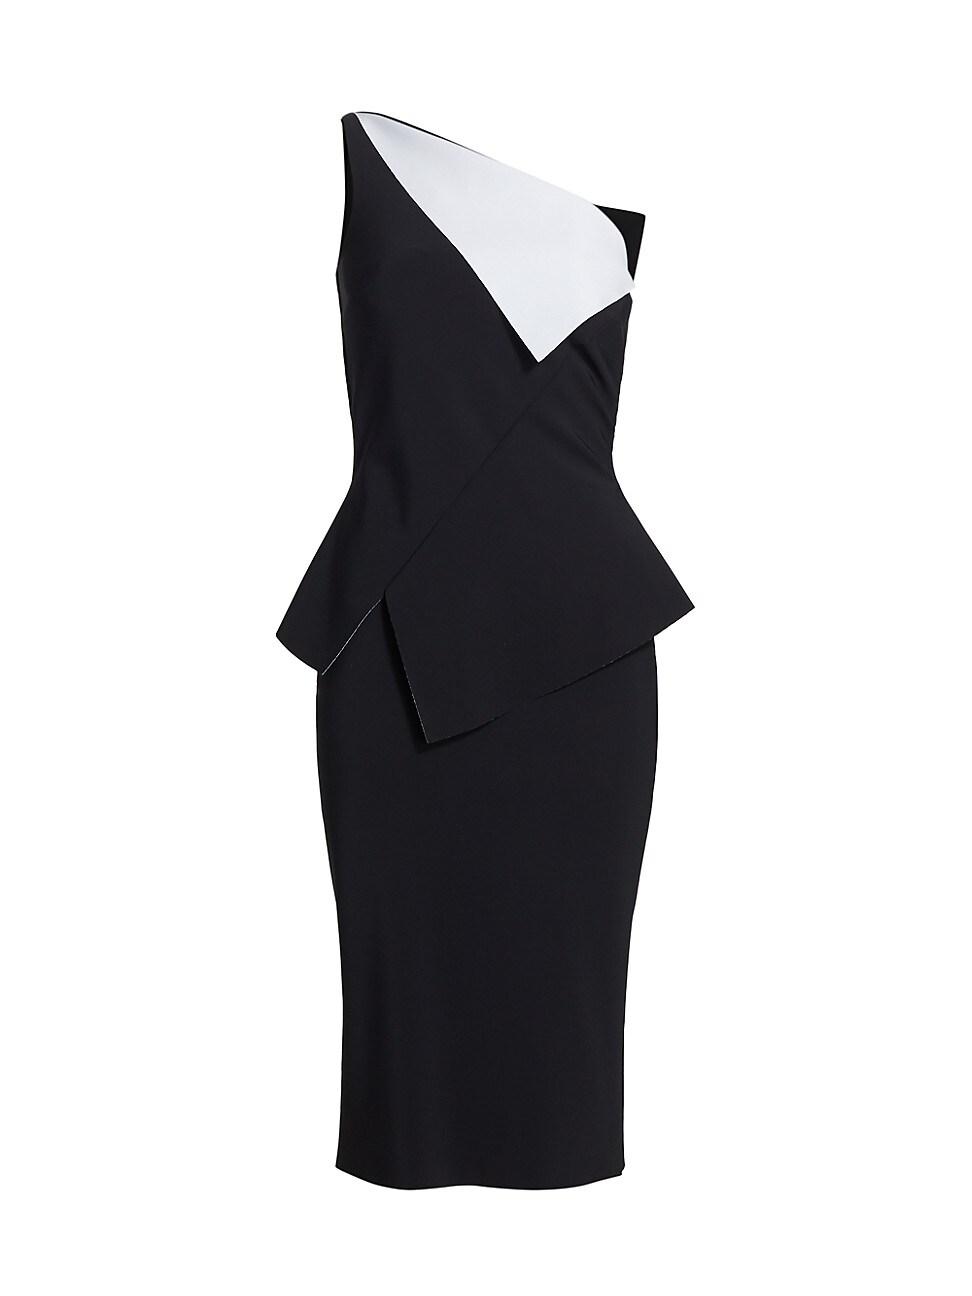 Chiara Boni La Petite Robe Dresses WOMEN'S CONTRAST ONE-SHOULDER DRESS